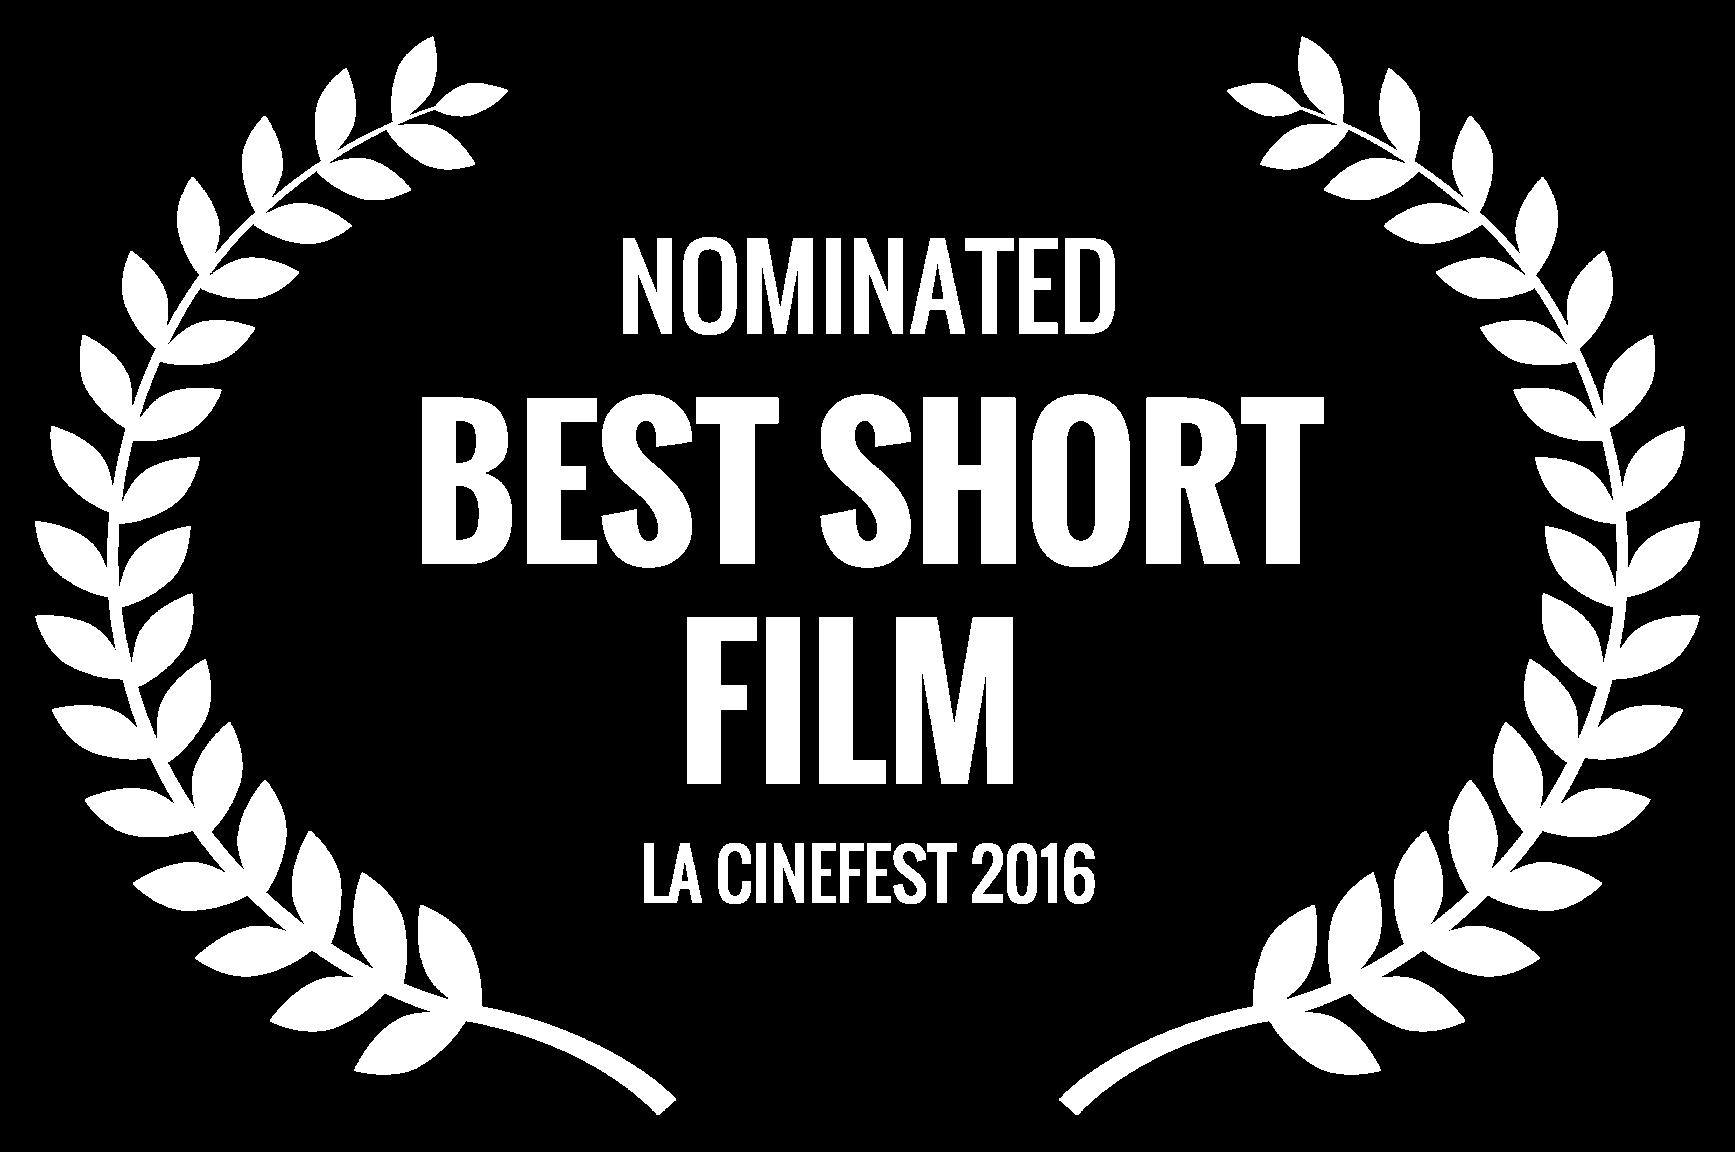 NOMINATED - BEST SHORT FILM  - LA CINEFEST 2016.png